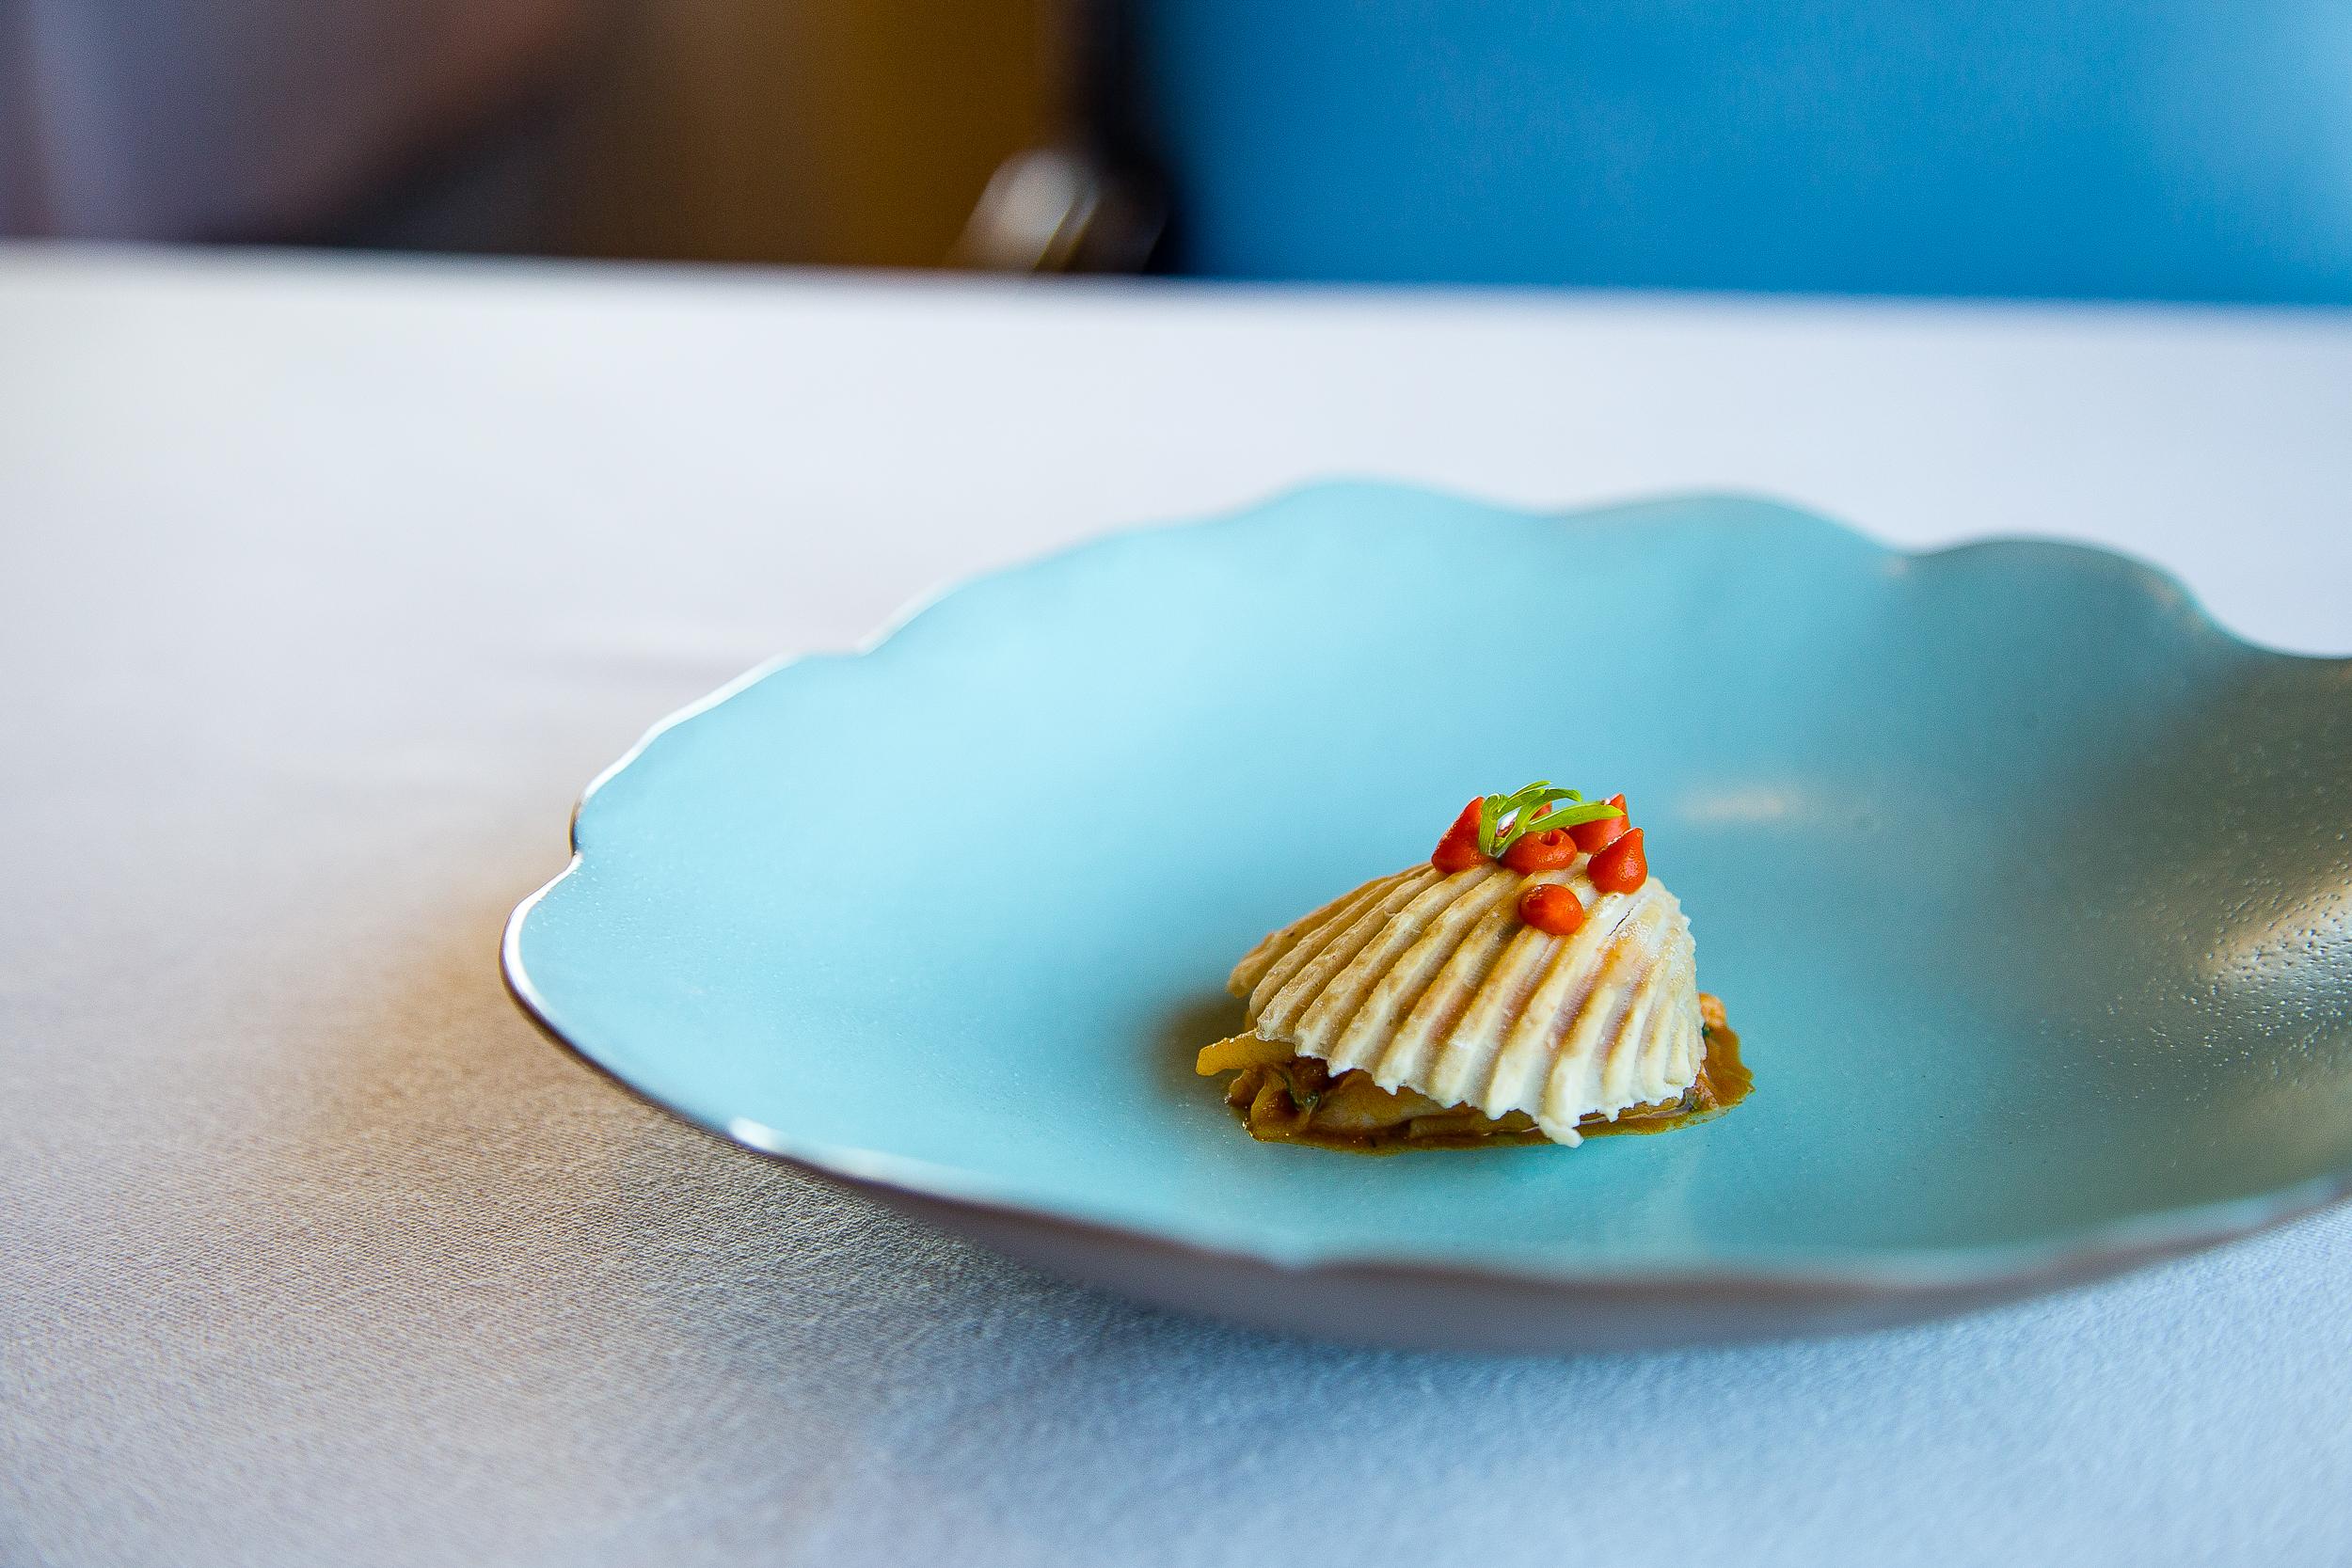 Small Pasta with Fish, Tomato Sauce Broth, Crispy Shell